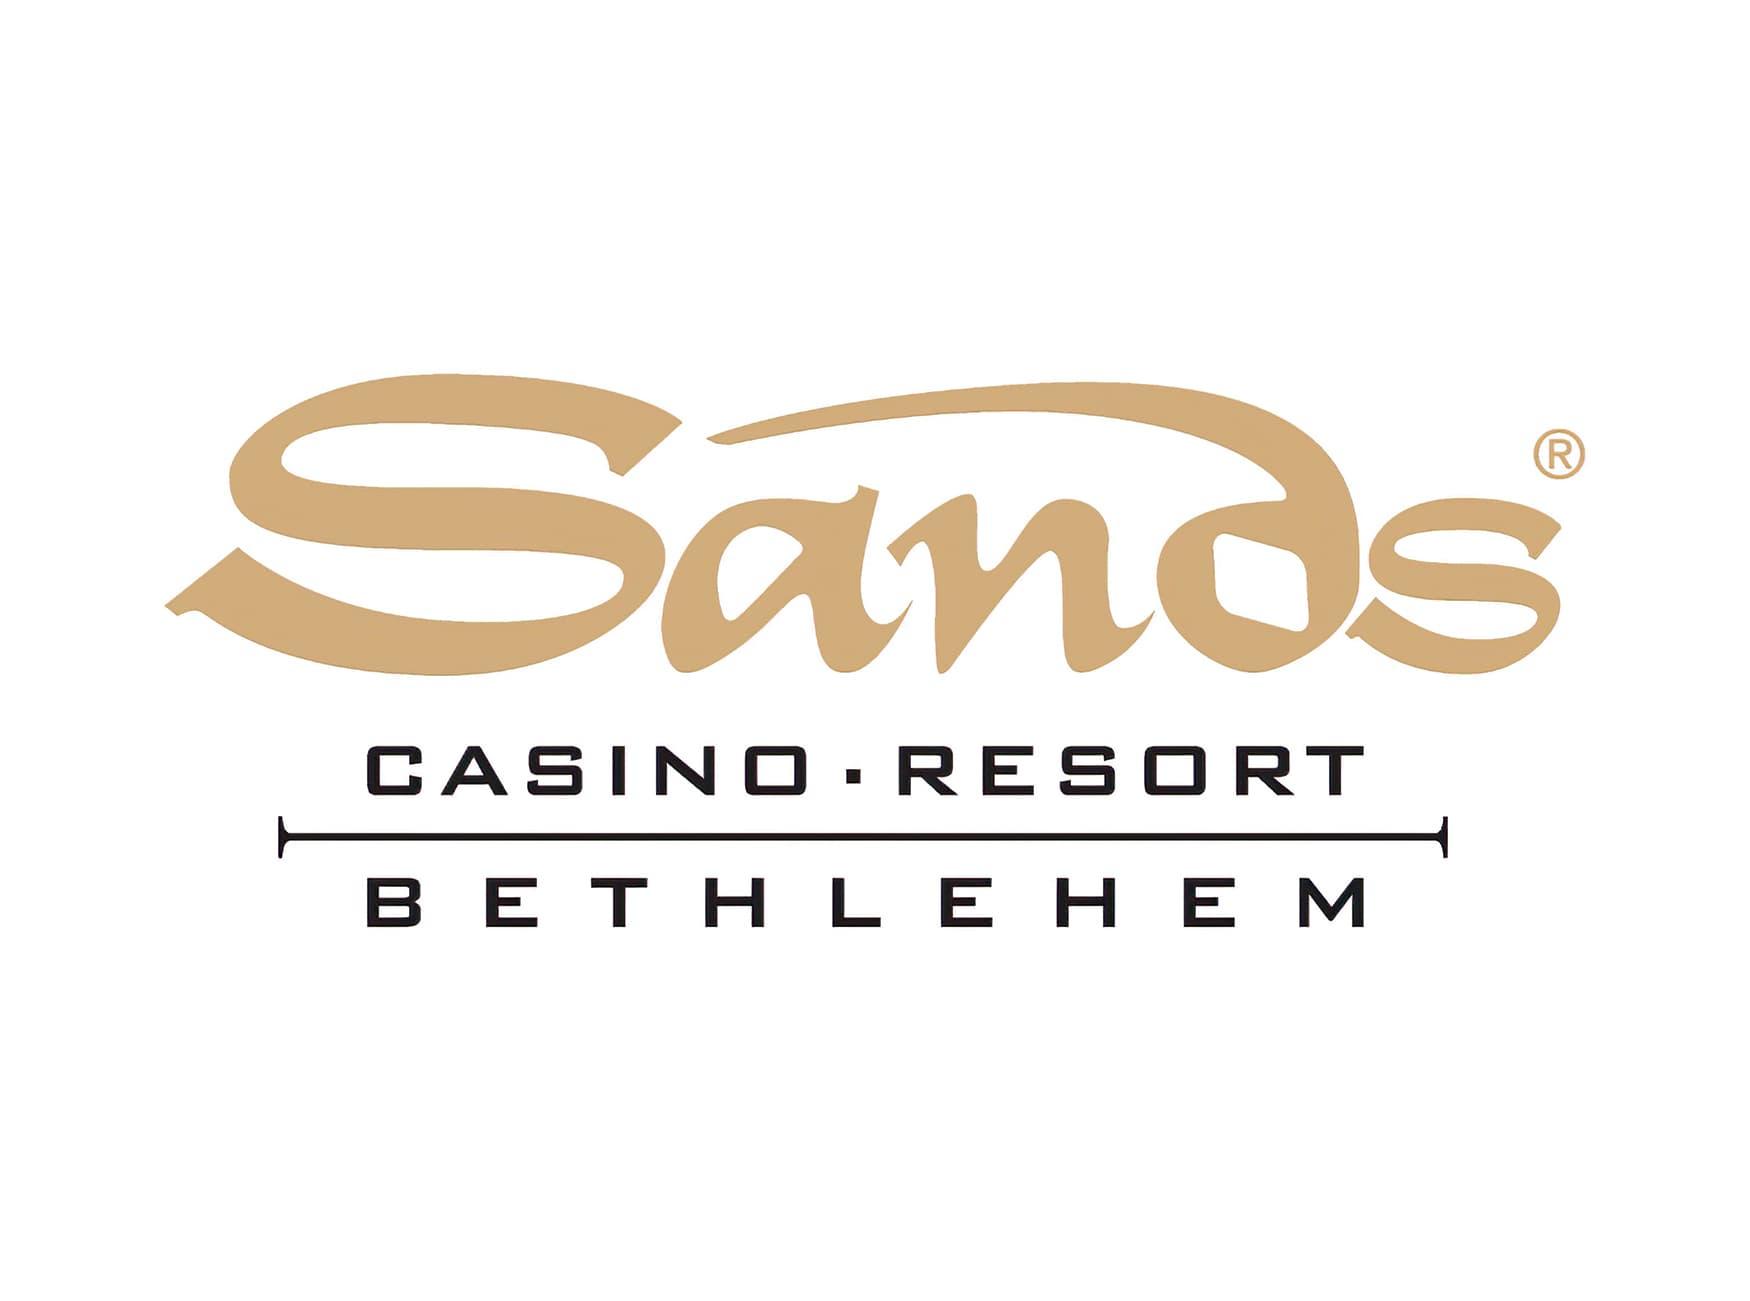 Sands Bethlehem Casino Resort. Environmental Graphics and Wayfinding System Design. Hospitality Design. Branding and Logo Design.